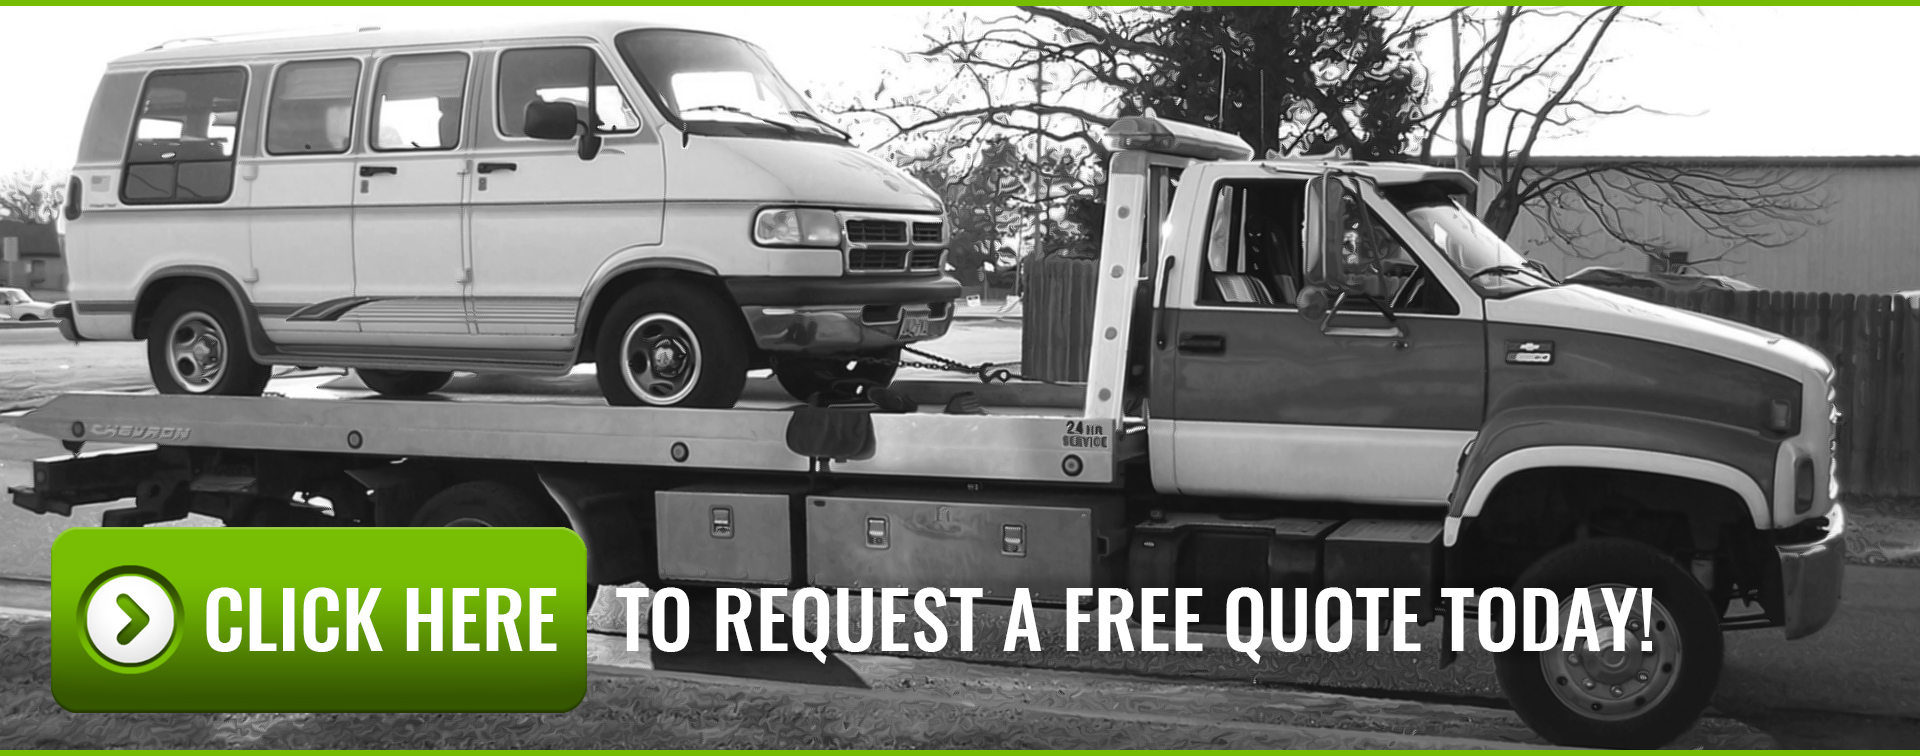 Pennsylvania Tow Truck Insurance